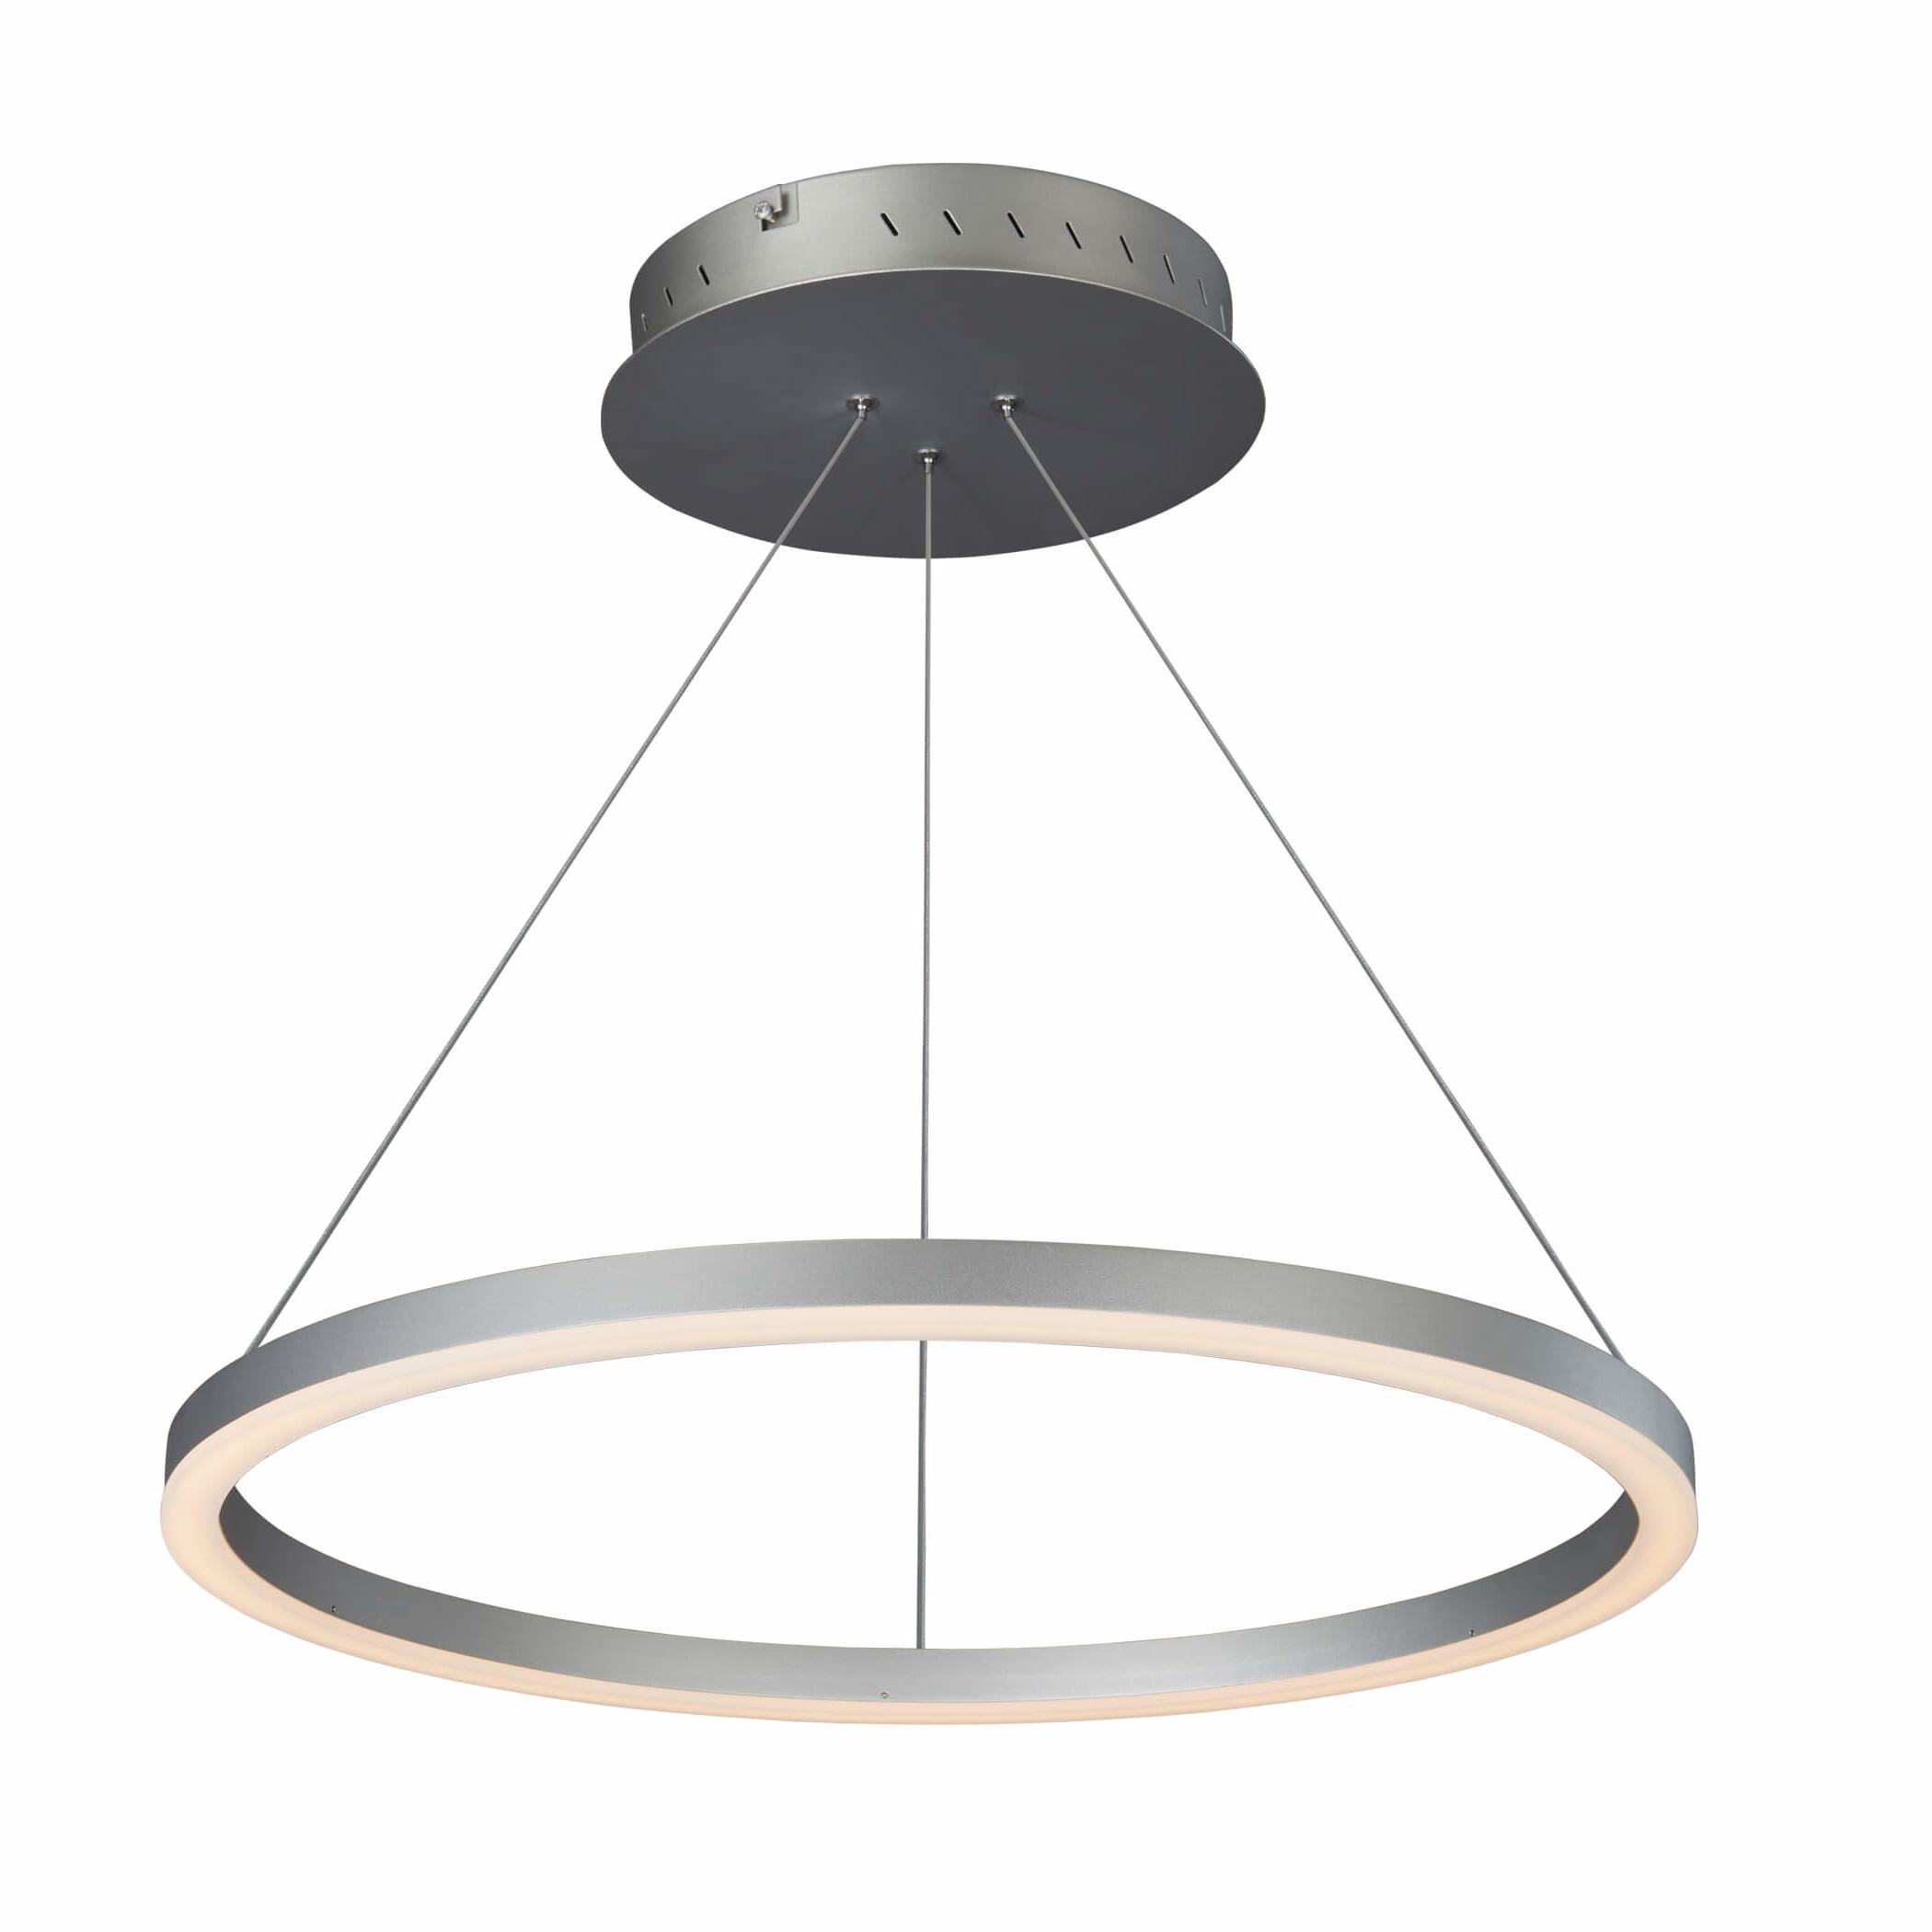 Allmodern Pertaining To Tabit 5 Light Geometric Chandeliers (View 10 of 20)